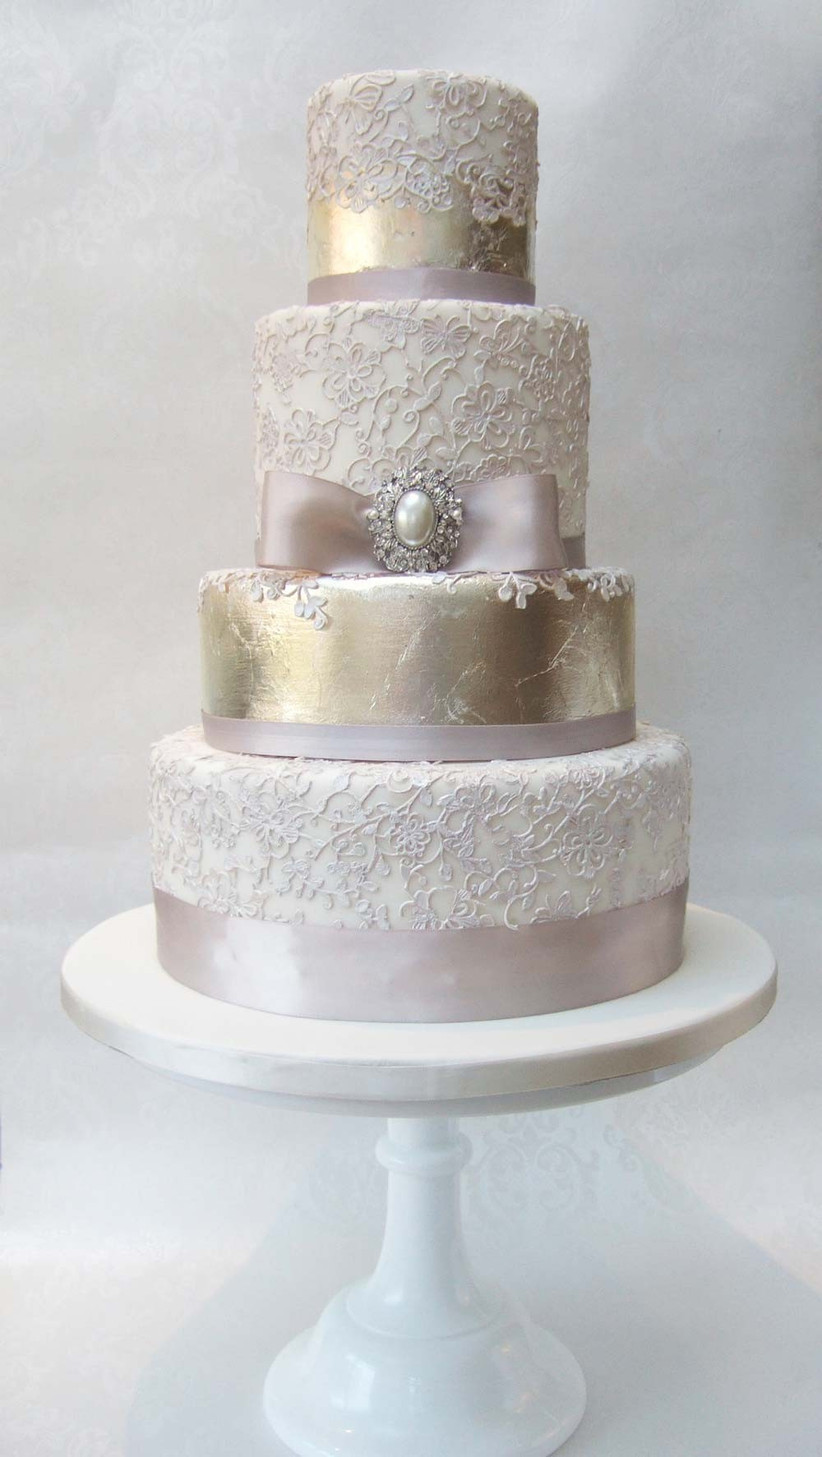 metallic-wedding-cakes-from-pretty-amazing-cakes-2